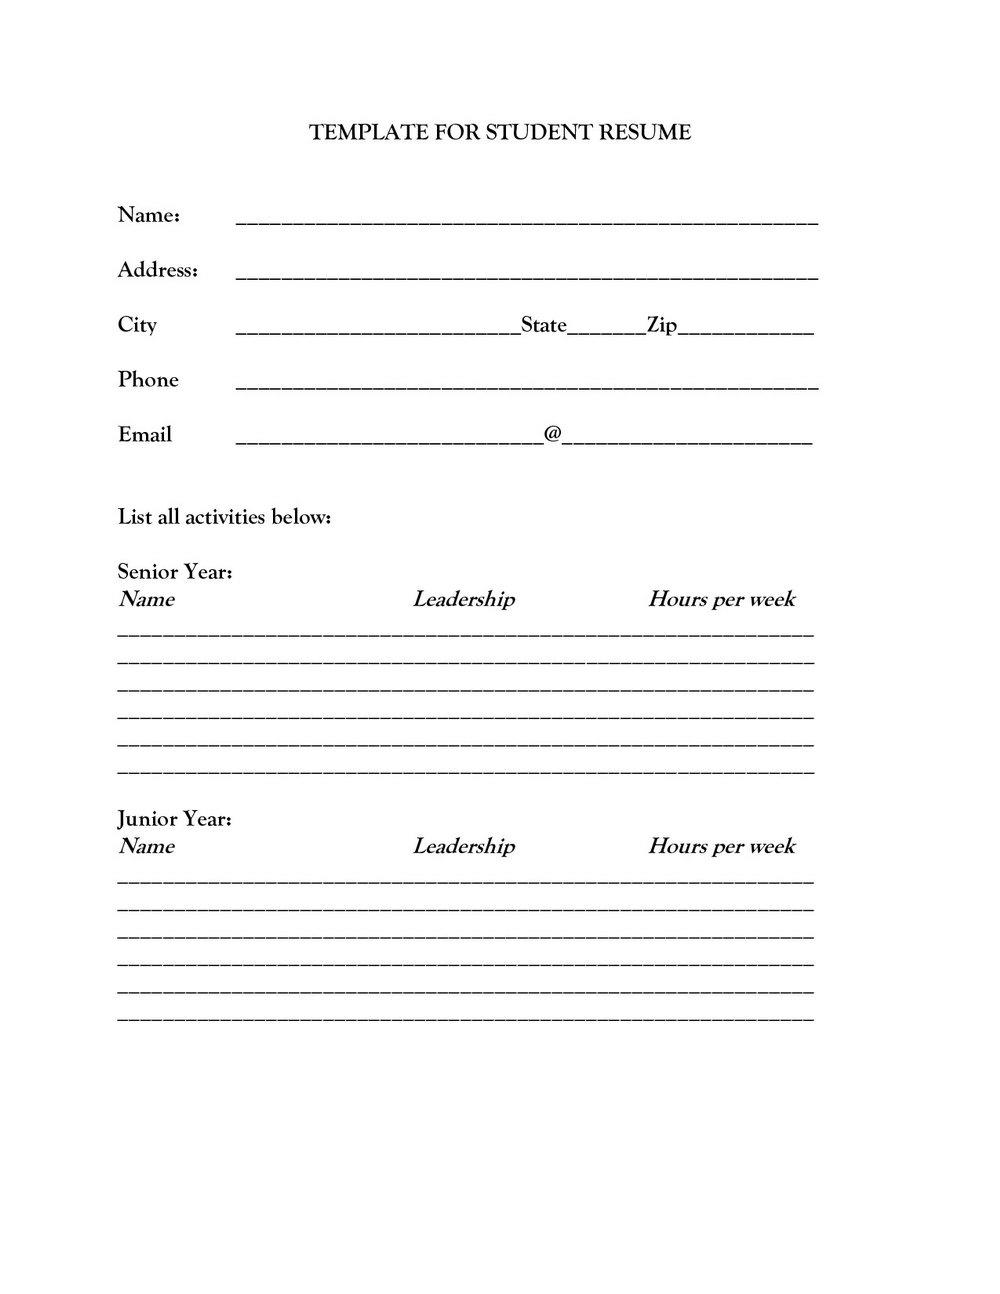 Blank Resume Format Pdf